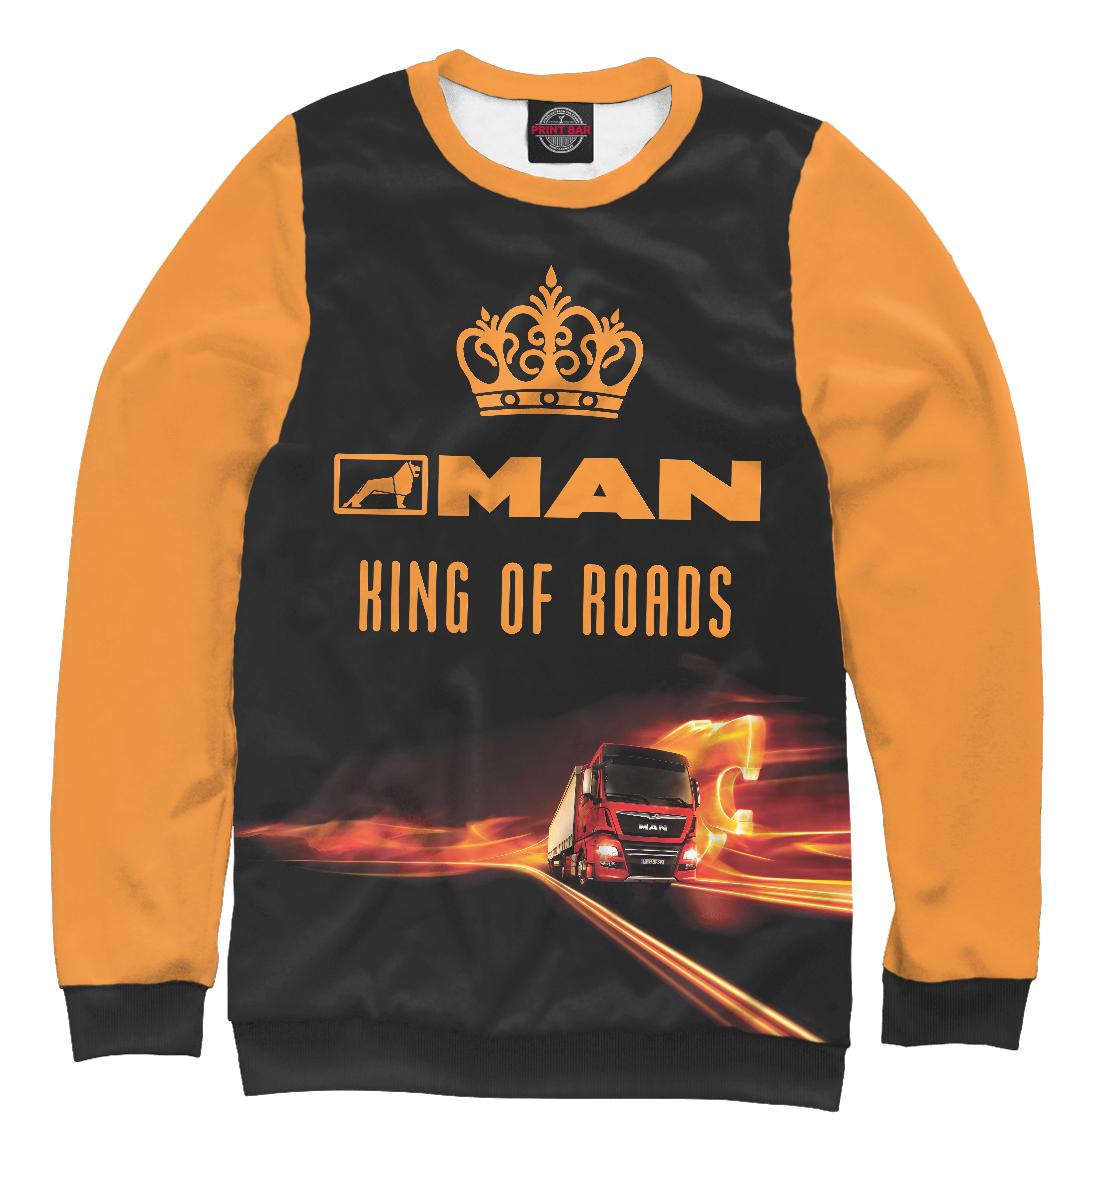 MAN - король дорог, Printbar, Свитшоты, GRZ-376133-swi-2  - купить со скидкой